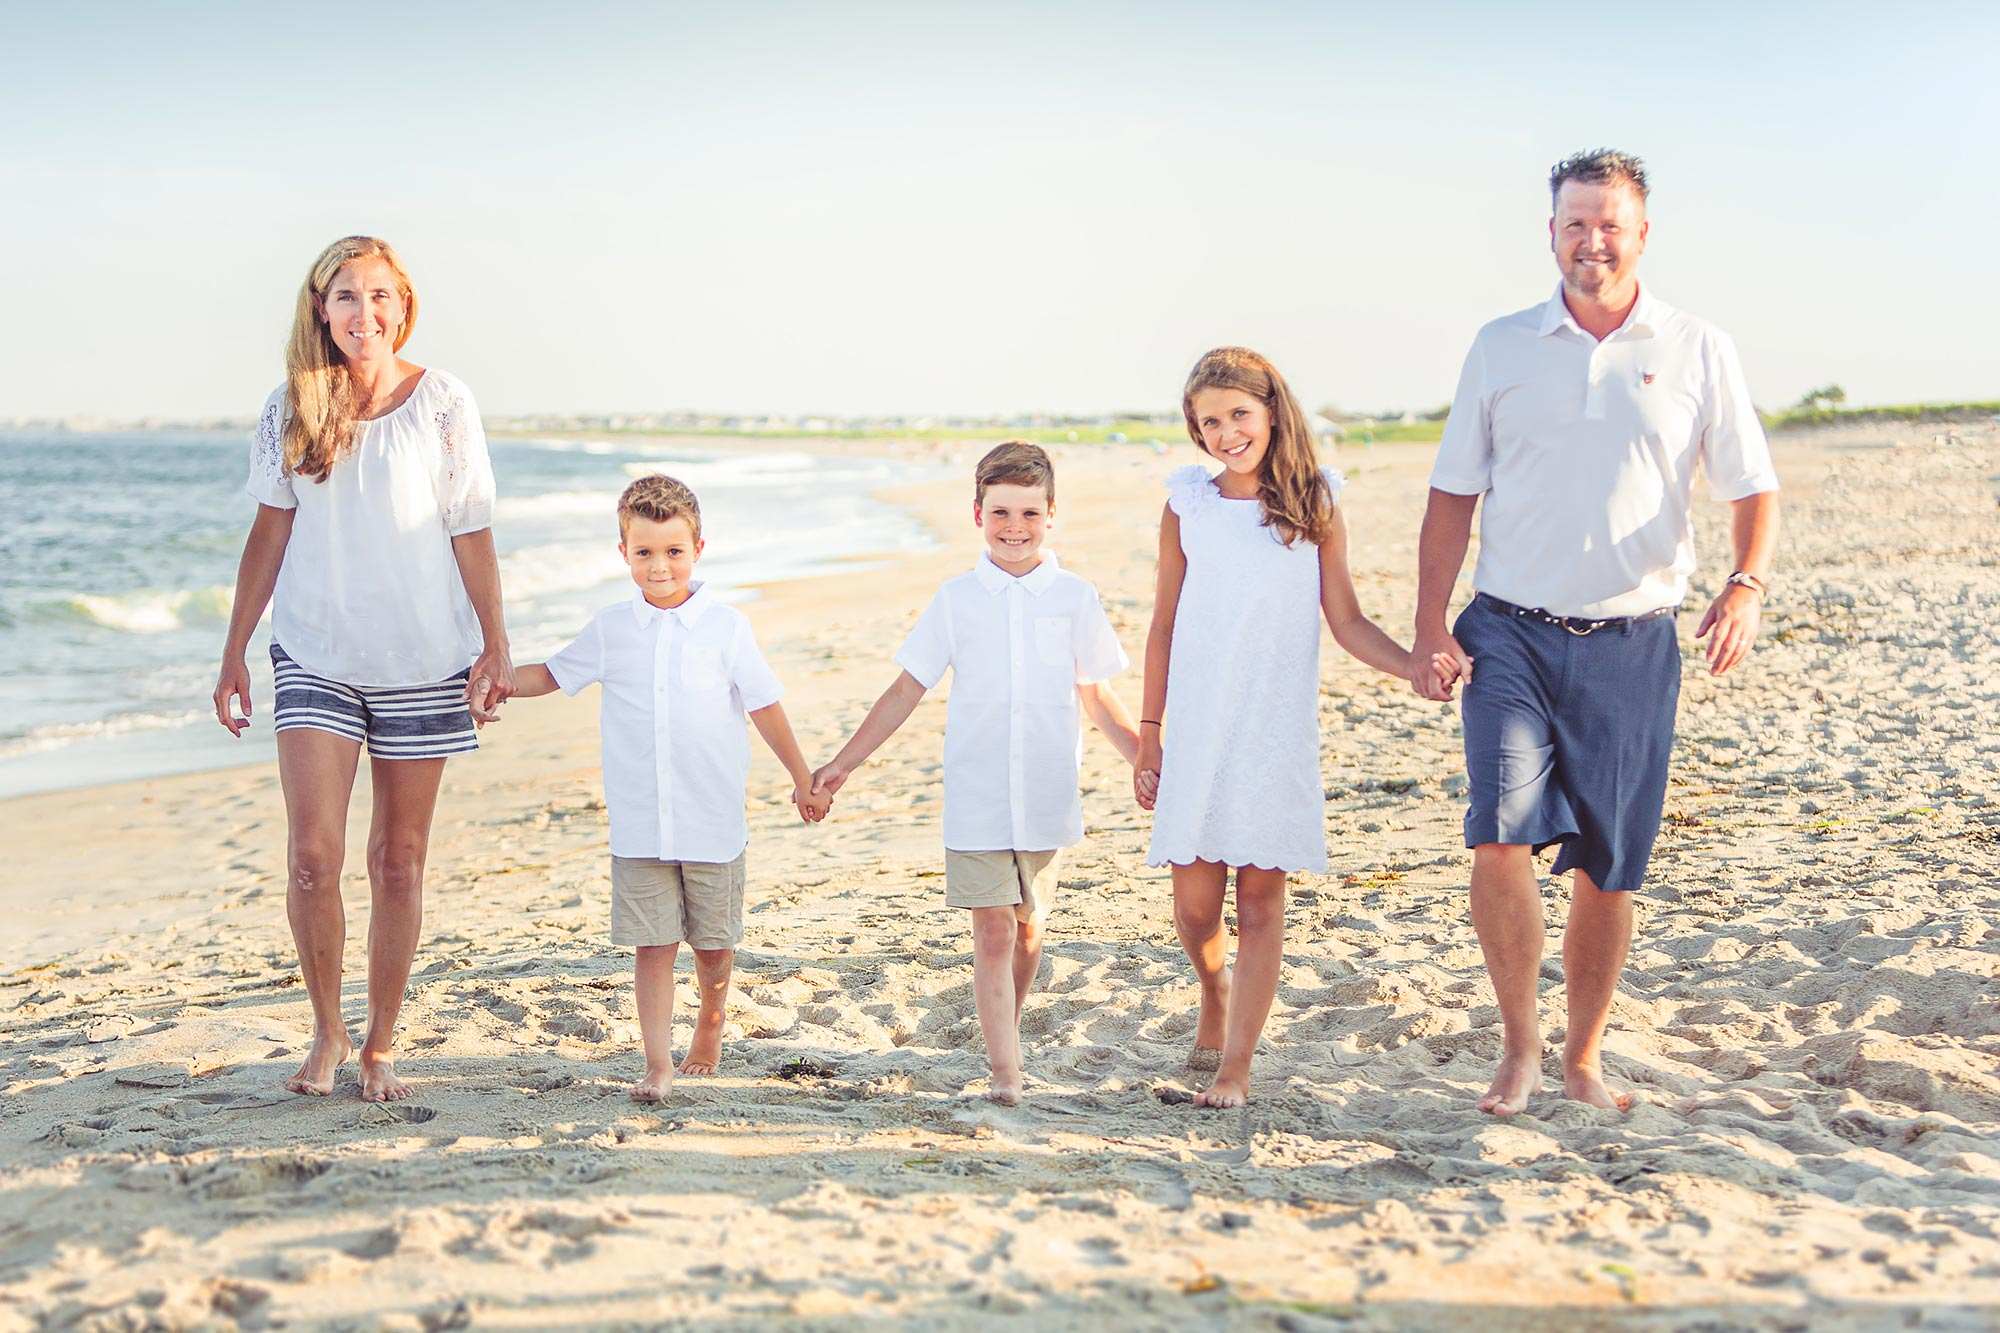 Plum Island Family Portrait Photographer   Stephen Grant Photography